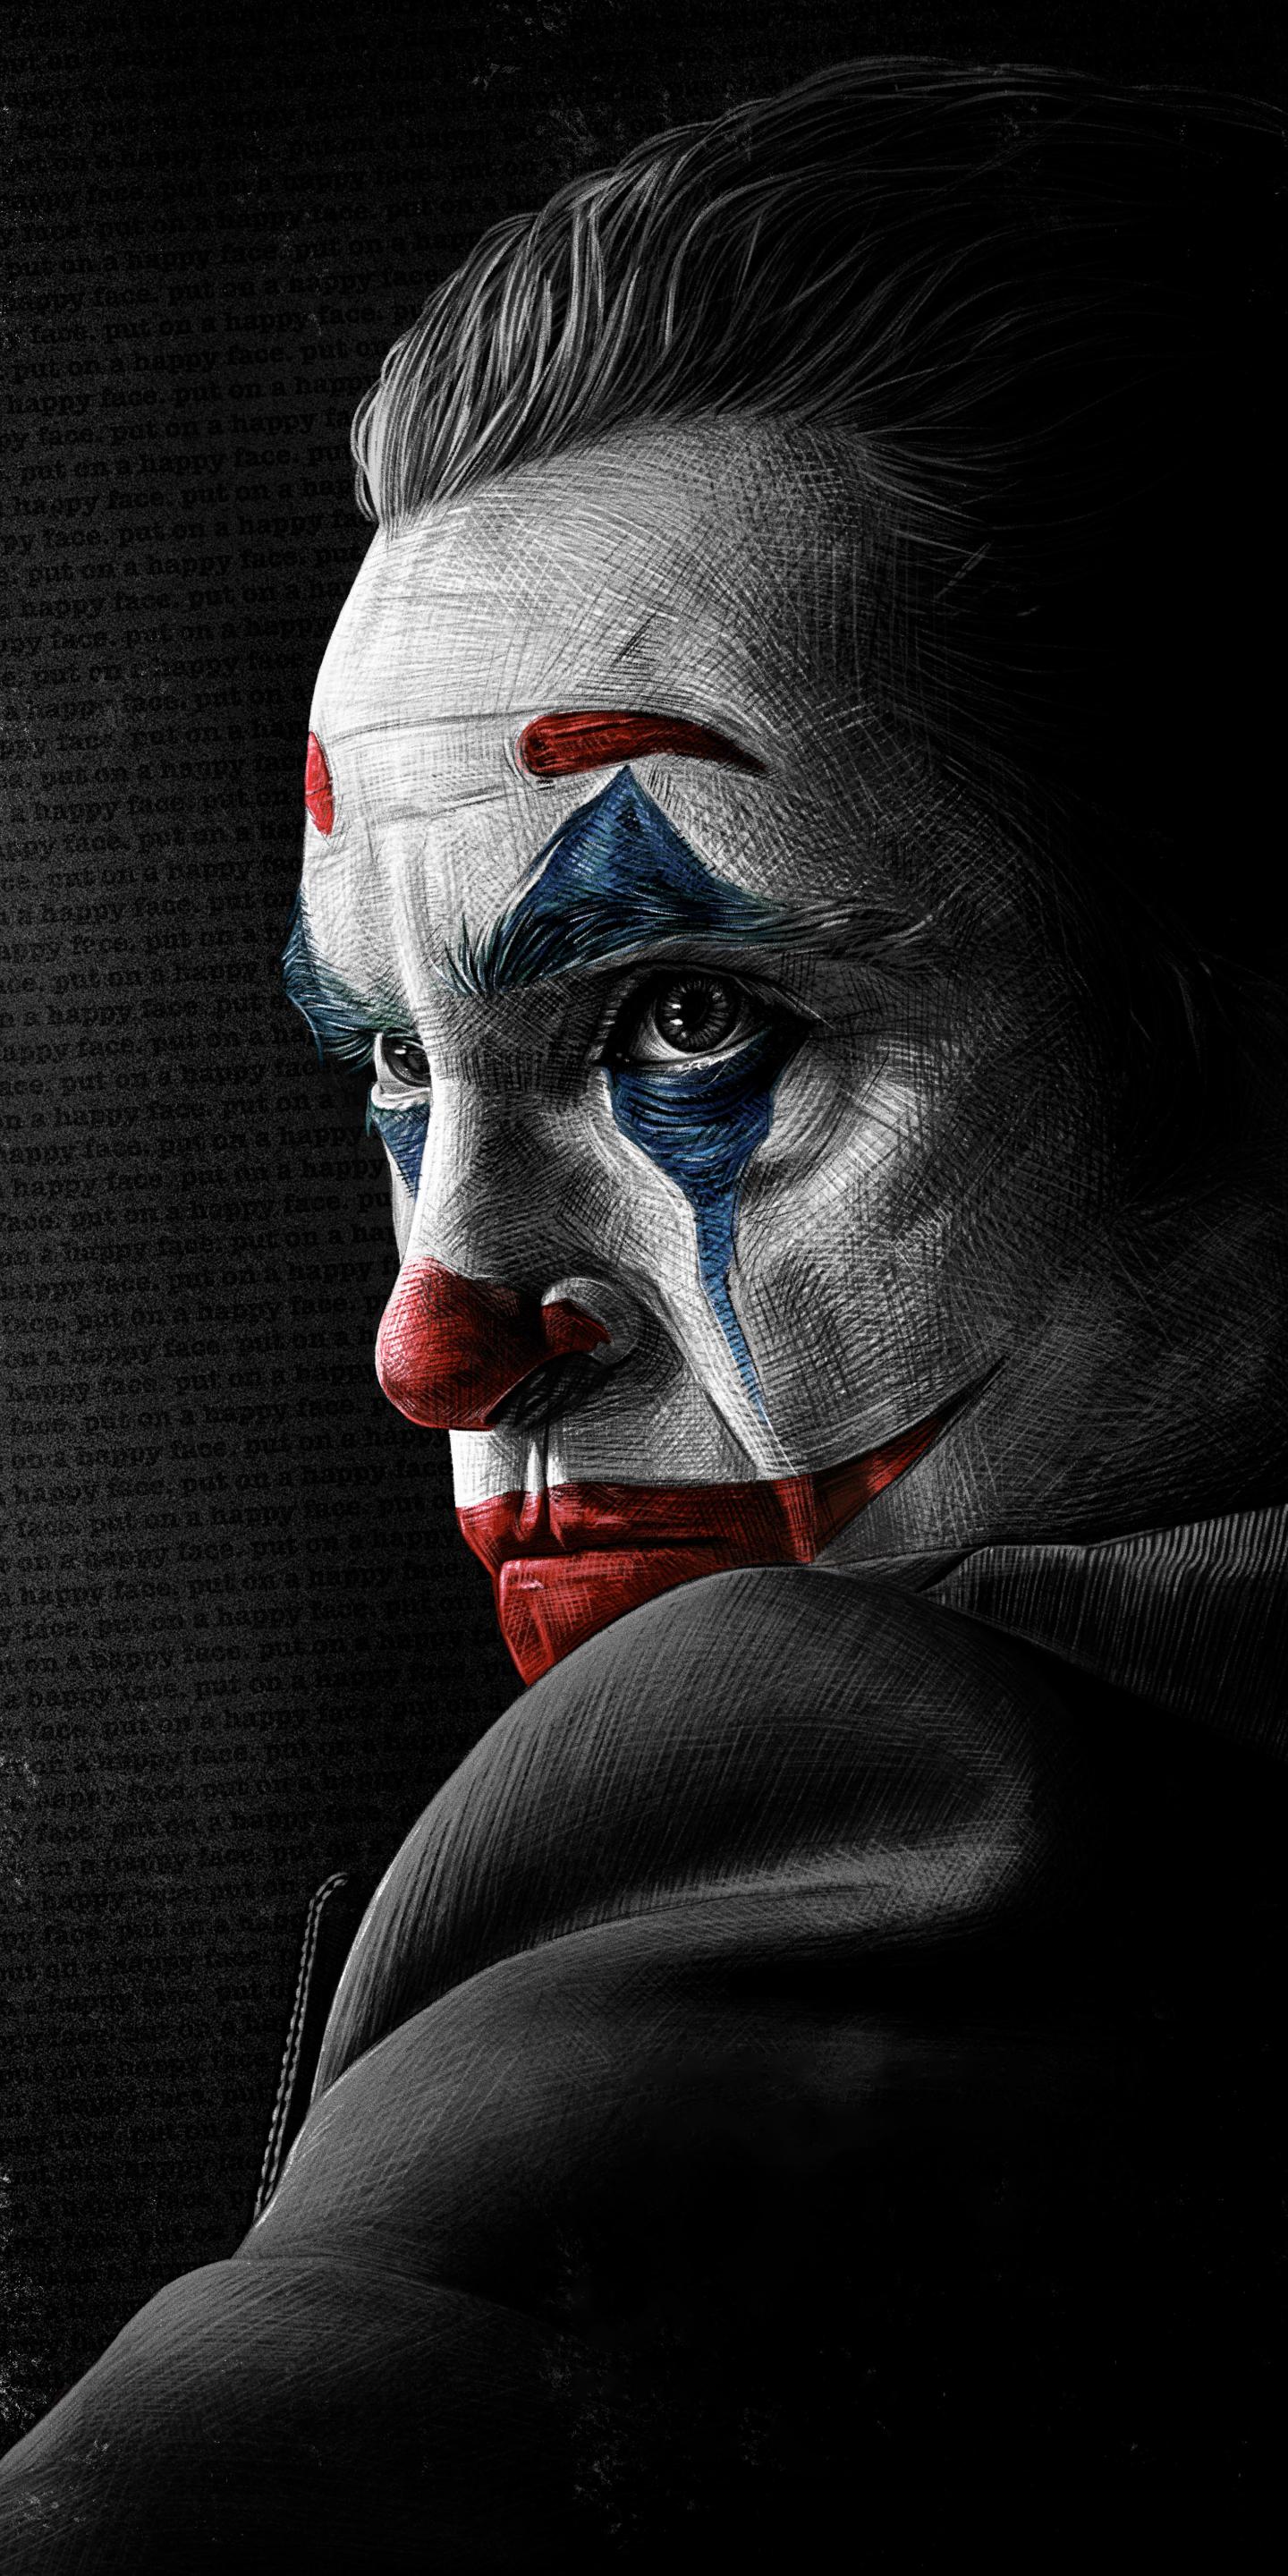 1440x2880 4k Joaquin Phoenix As Joker 1440x2880 Resolution ...